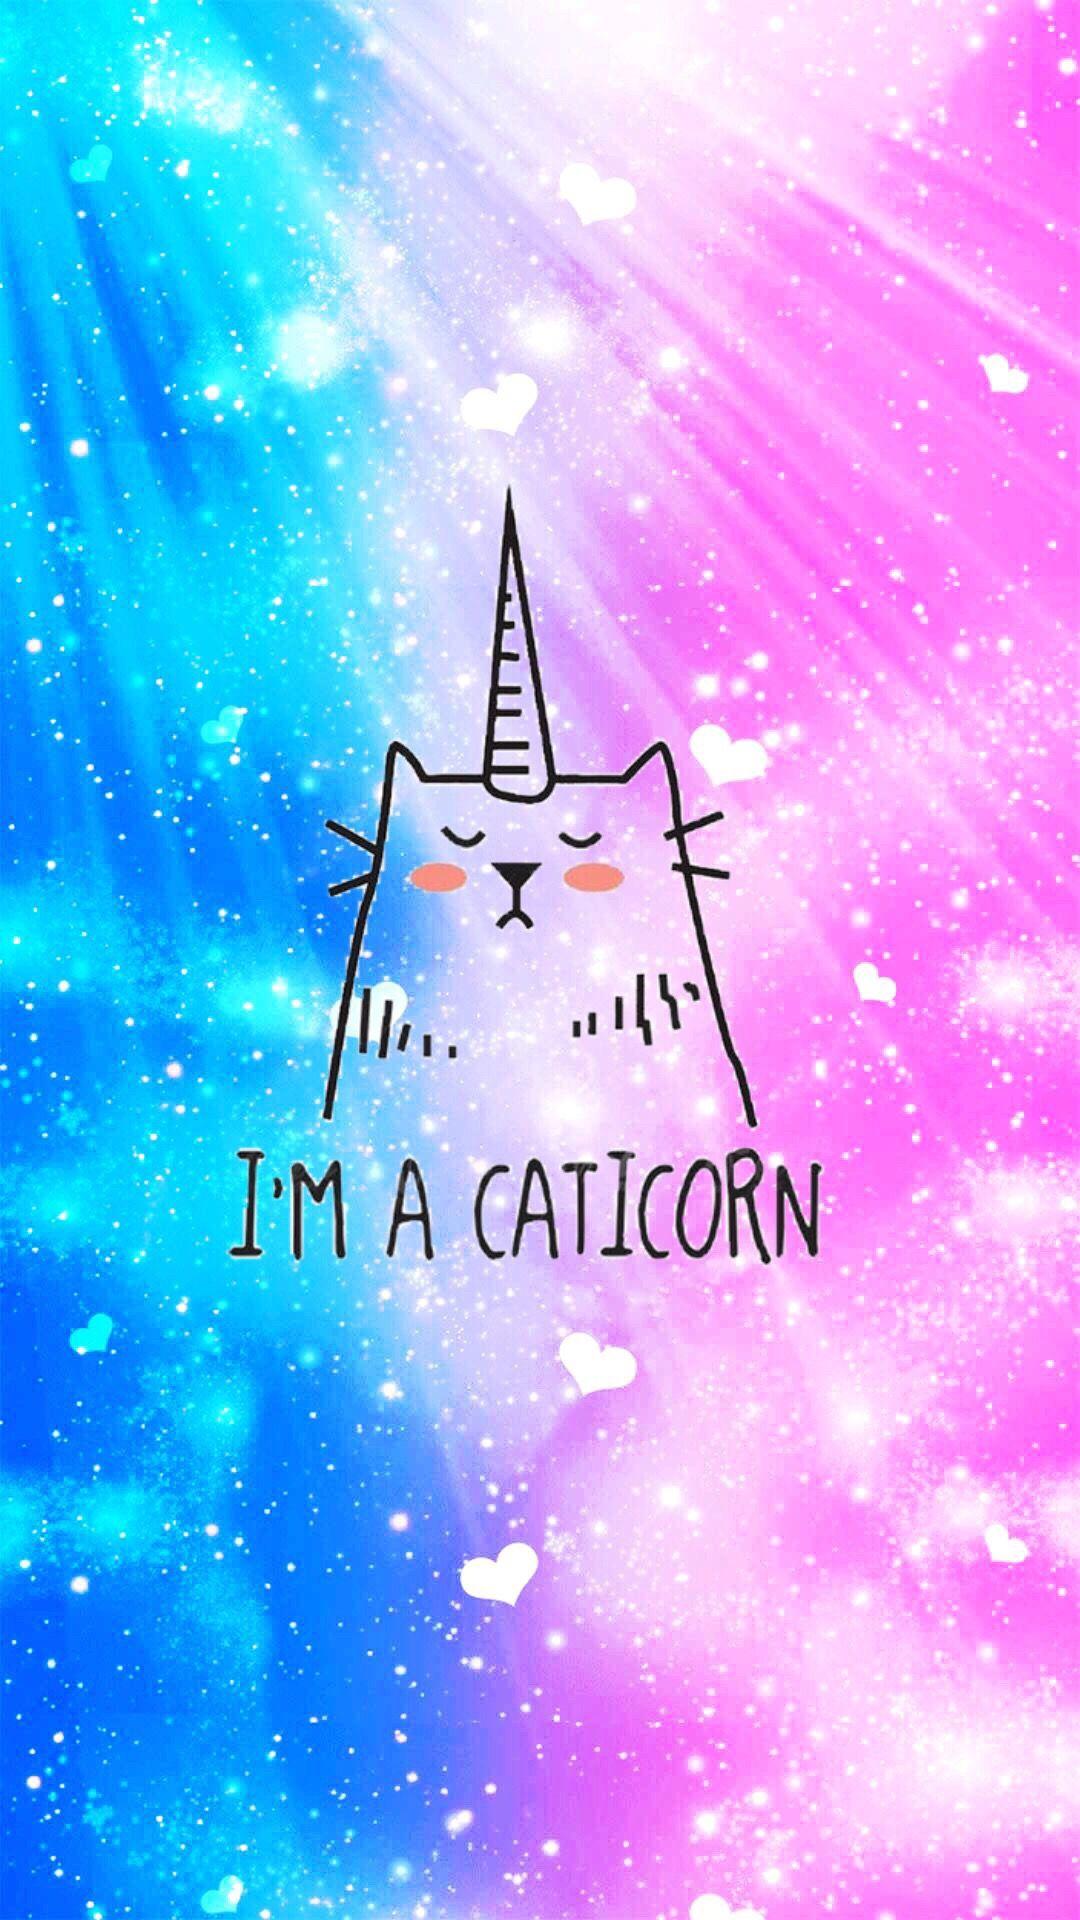 Caticorn Tumbler